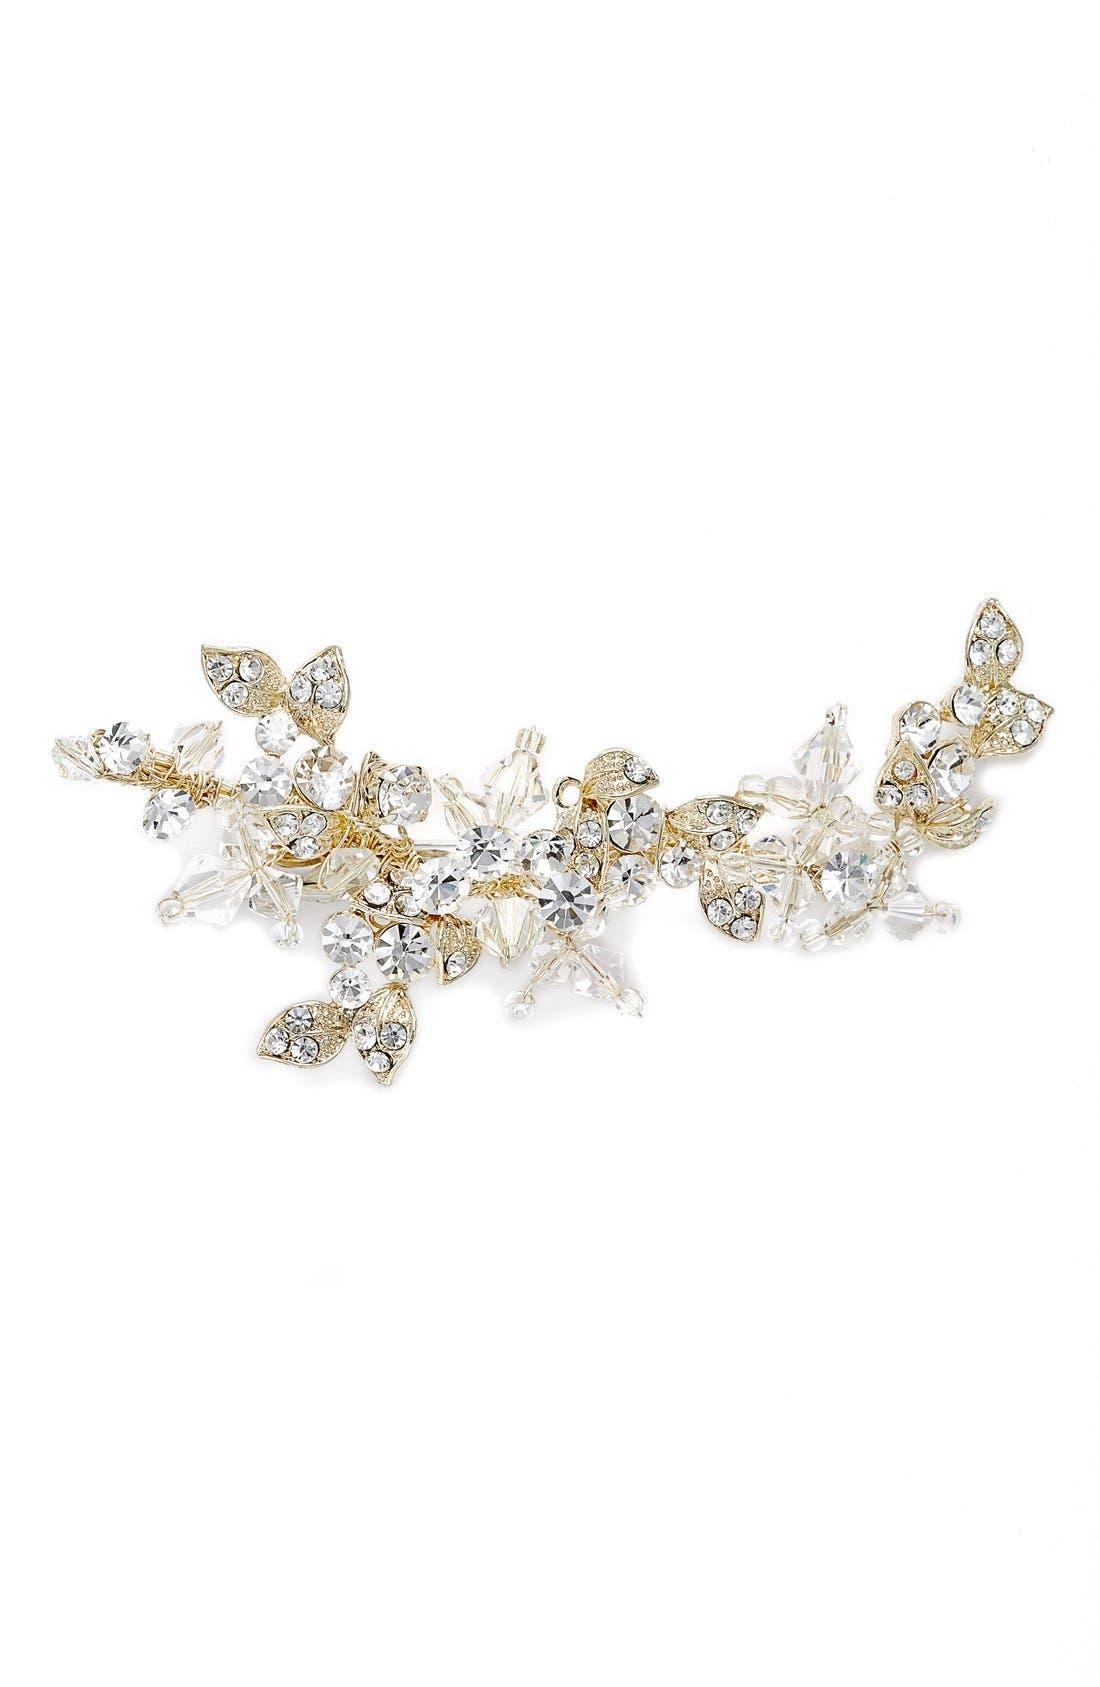 Brides & Hairpins 'Olivia' Jeweled Hair Clip